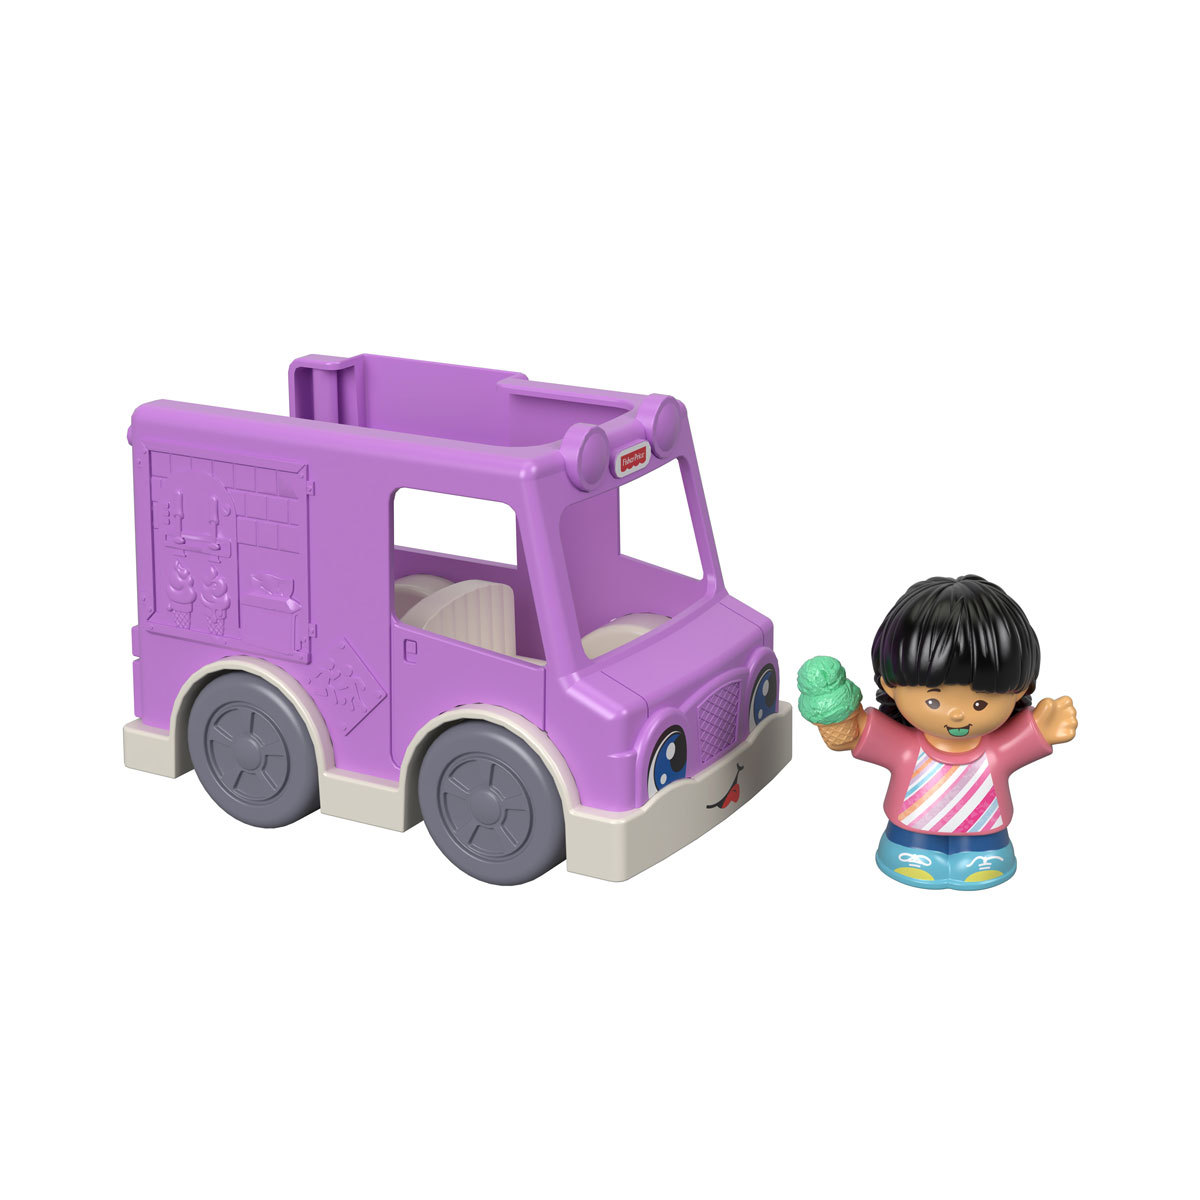 Fisher-Price Little People Vehicle and Figure - Ice Cream Van